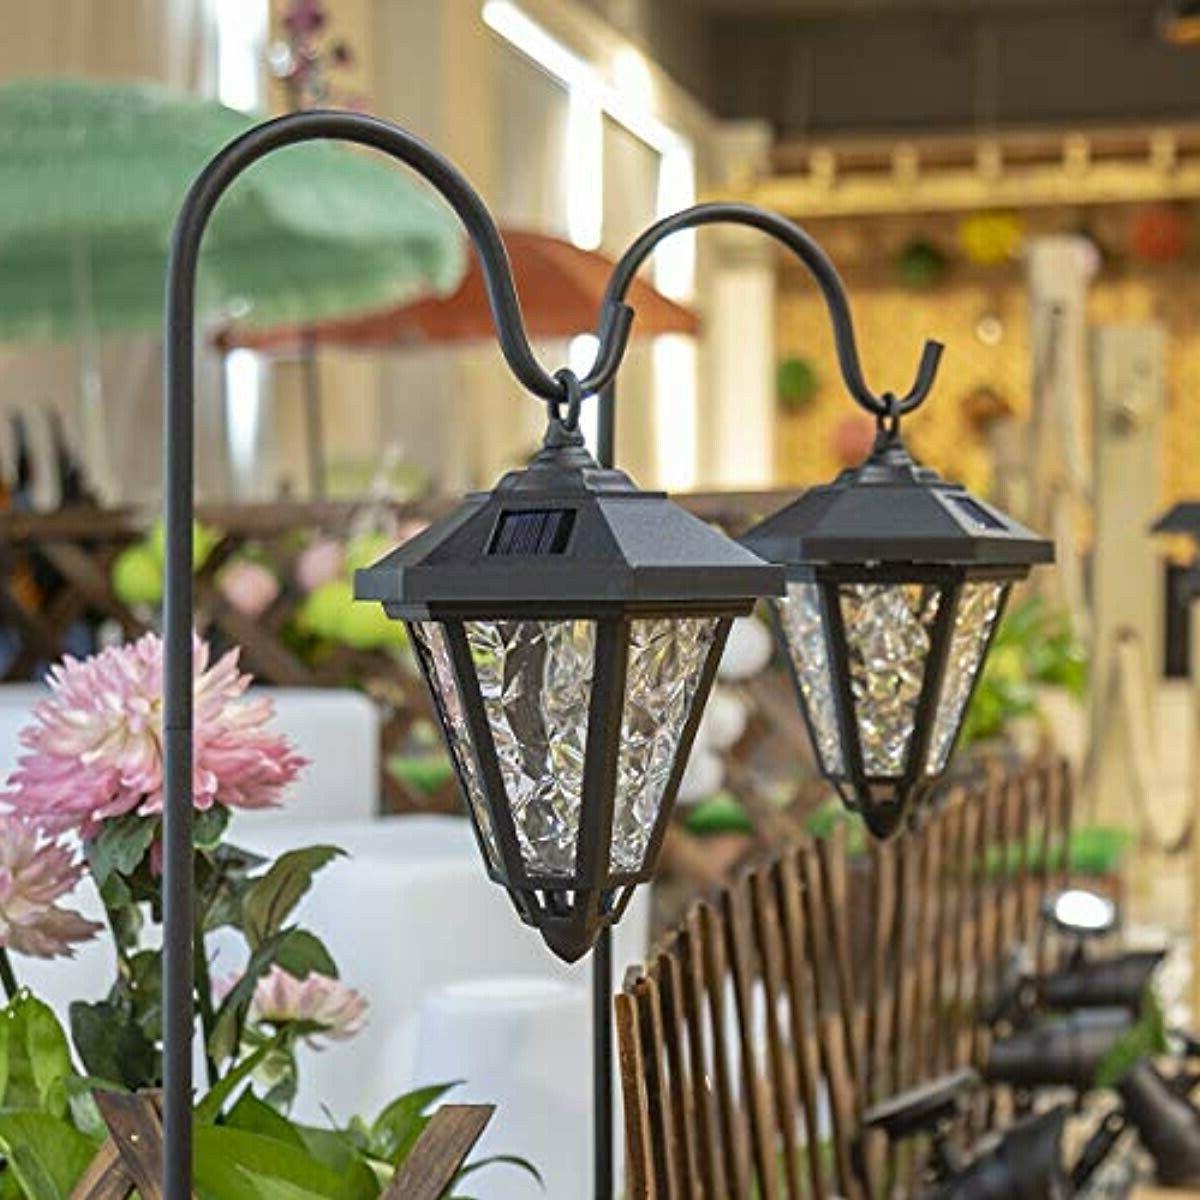 GIGALUMI Lights Hanging Coach Lantern 2